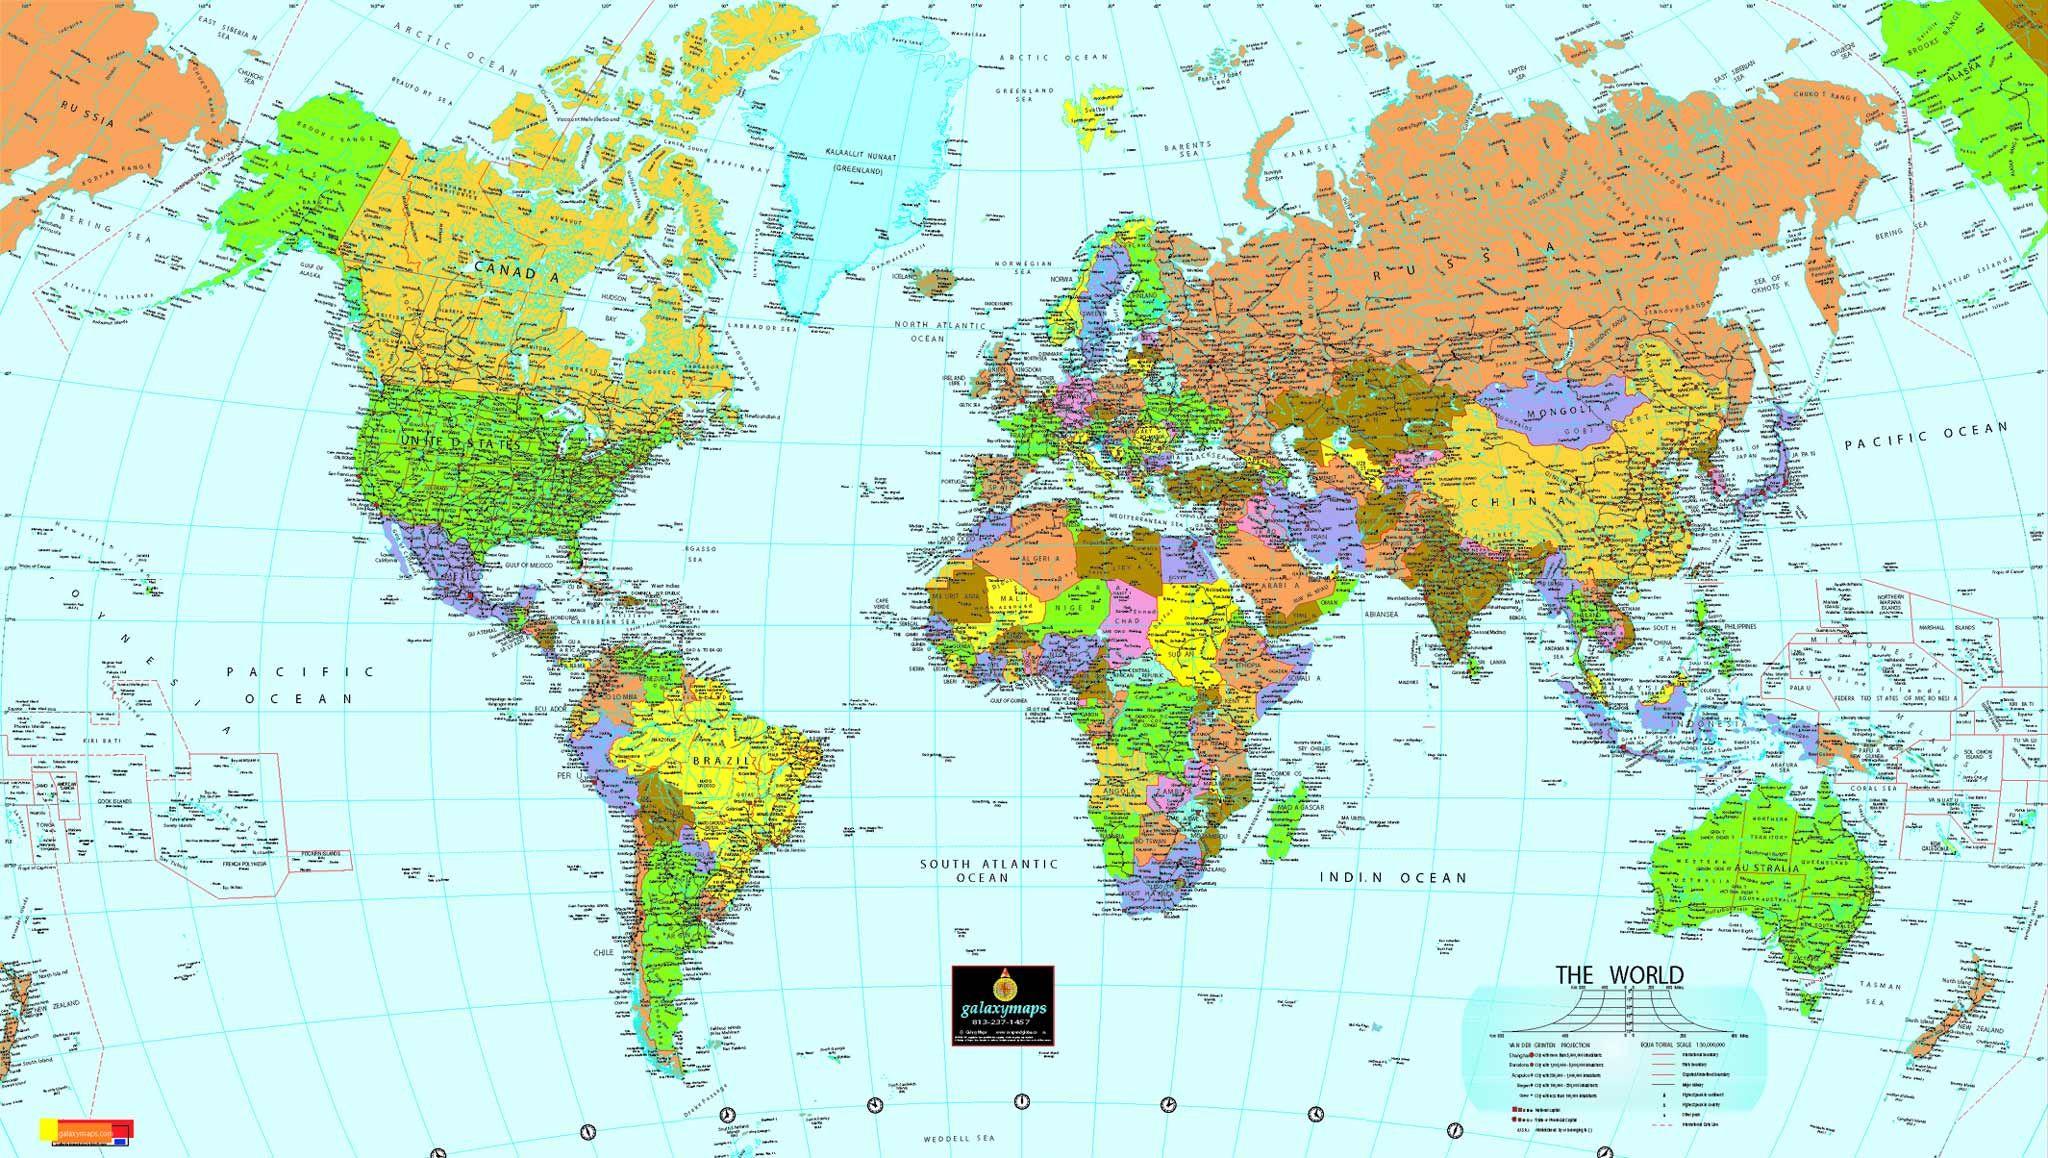 Ktalar haritas googleda ara fizik pinterest searching full updated around the world in 80 days bigfish gumiabroncs Image collections